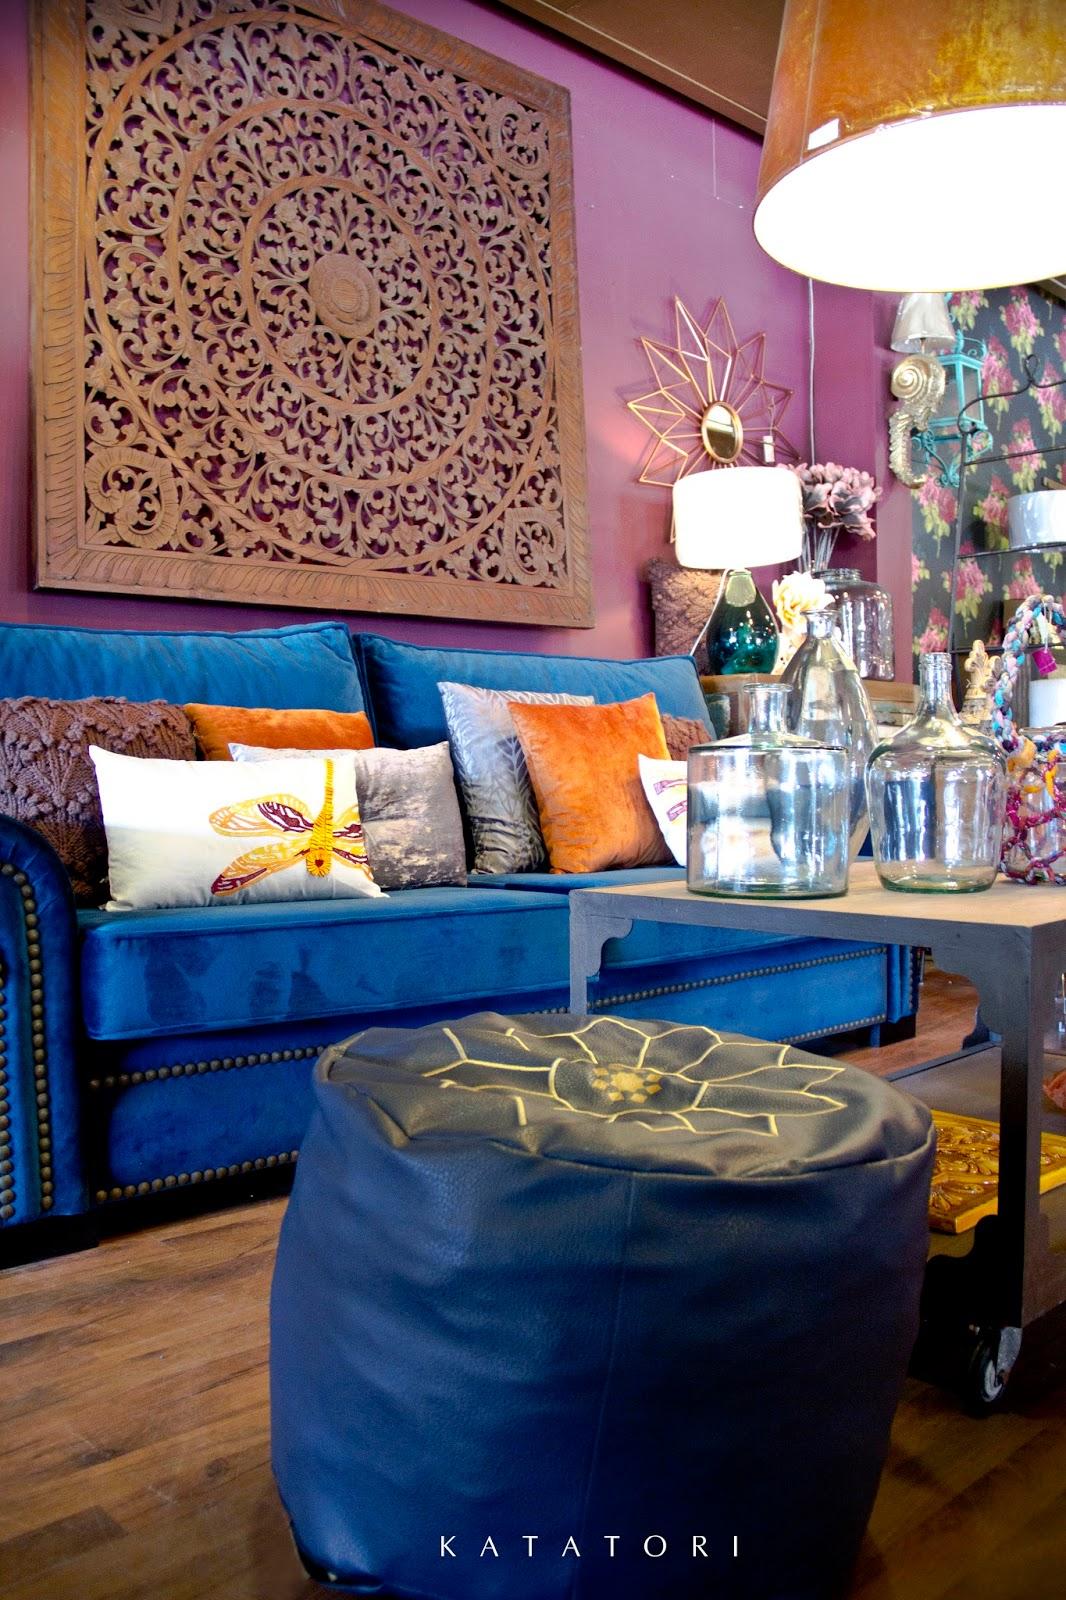 Katatori interiores cojines for Oportunidades gaditanas muebles